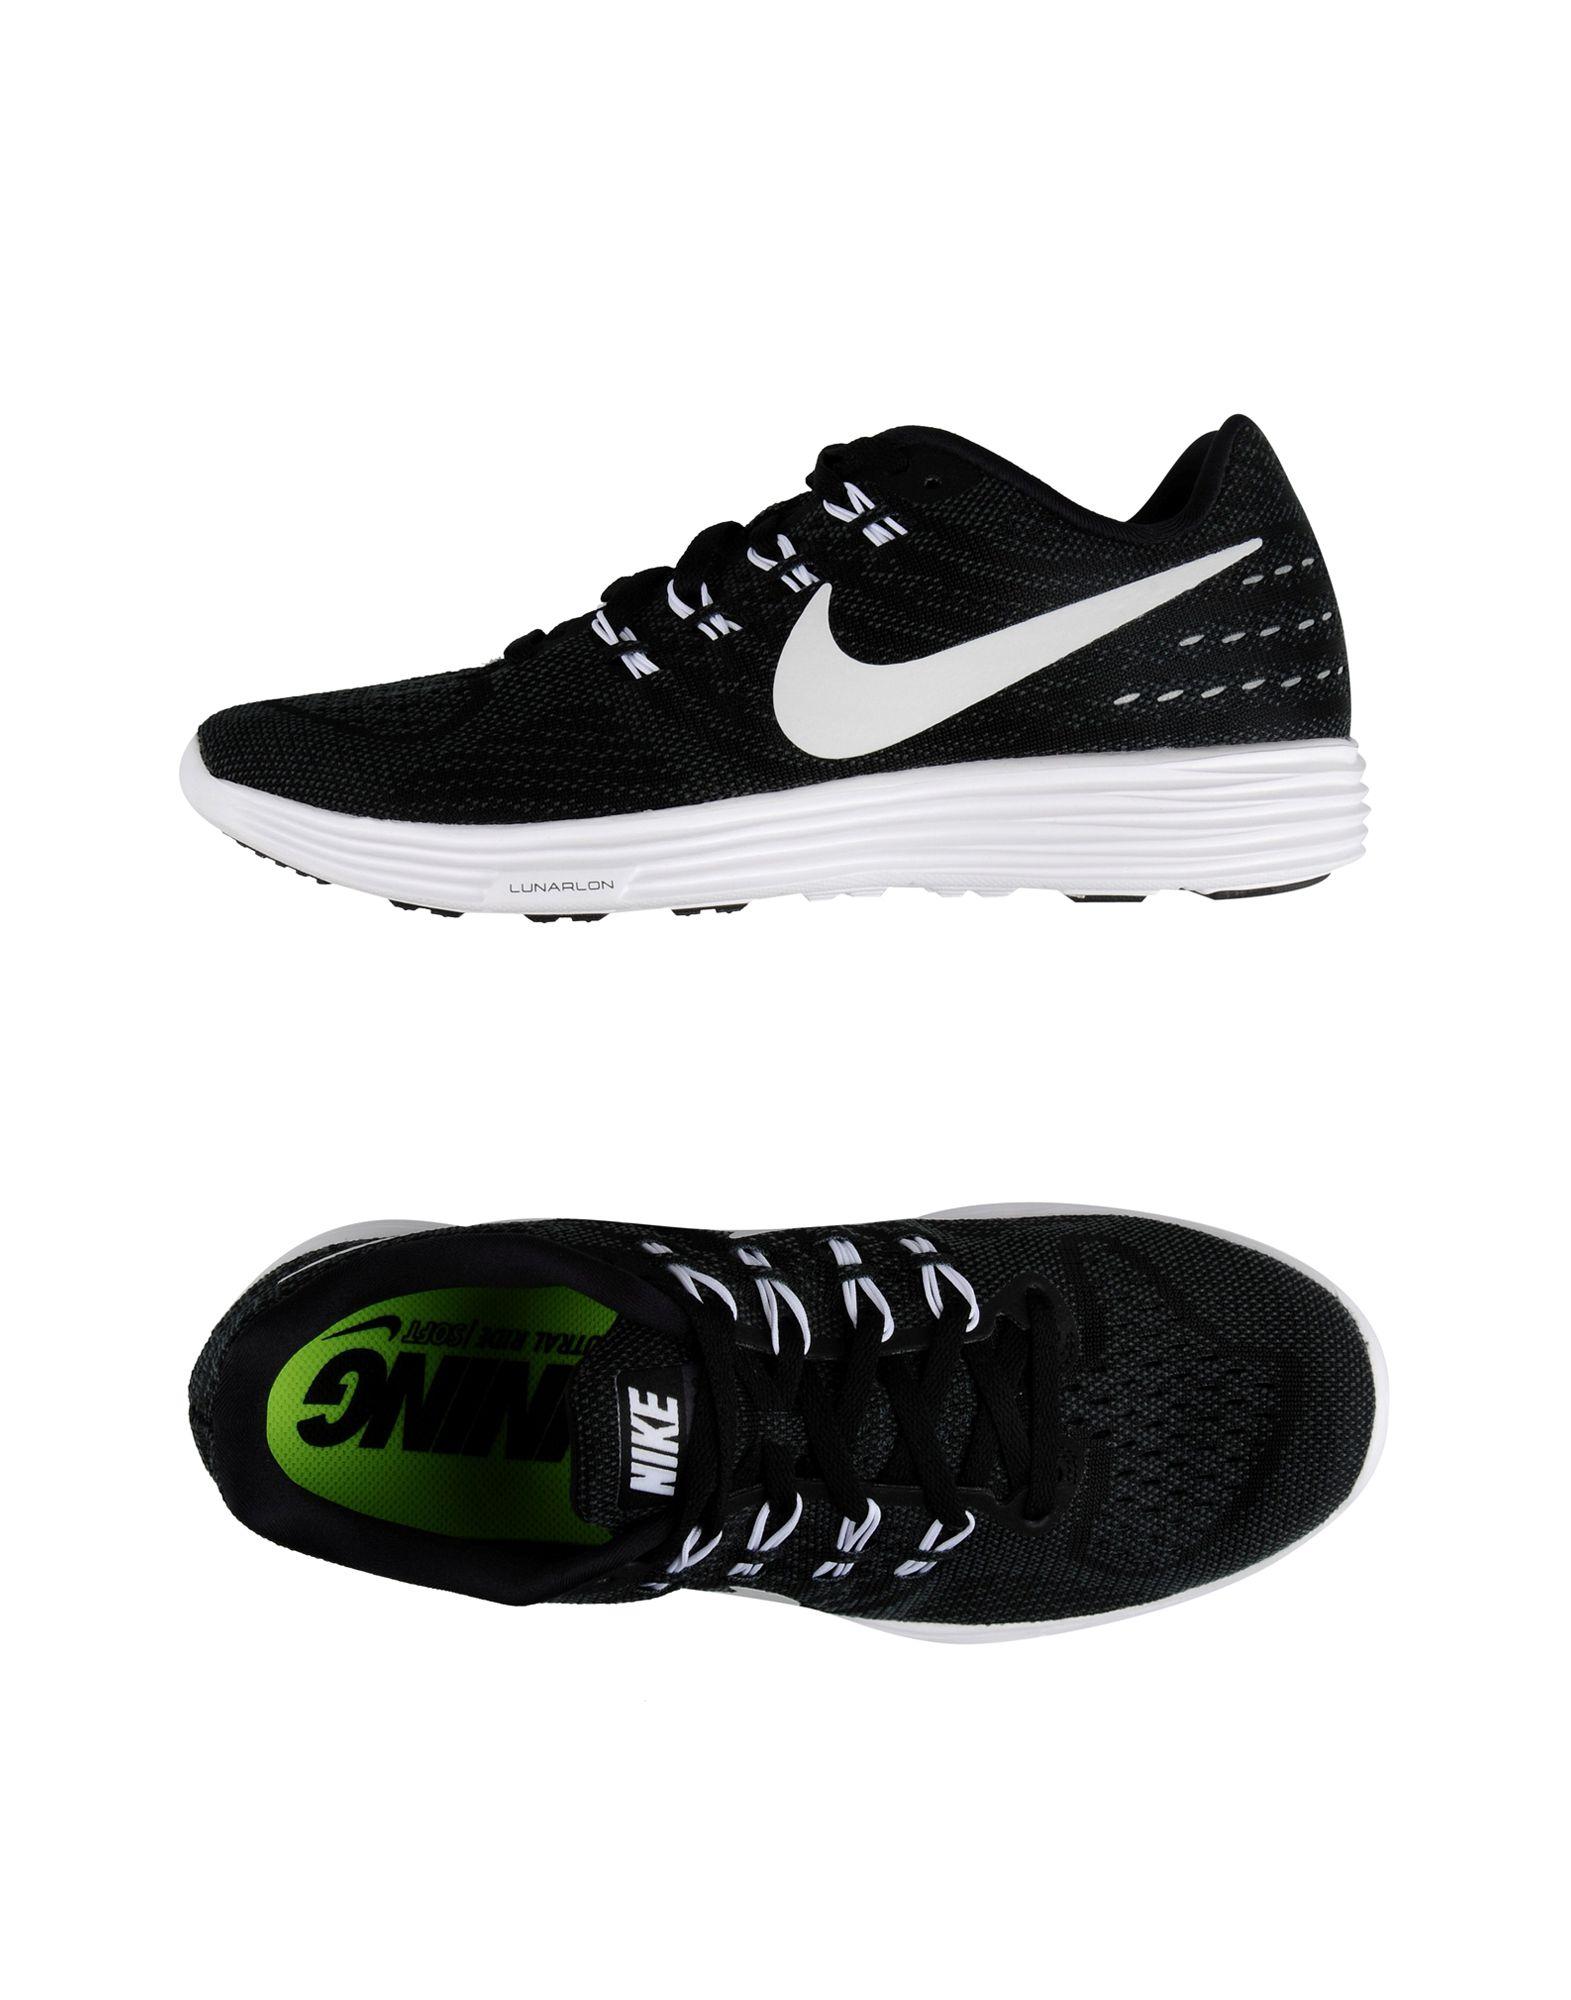 Nike Wmns Nike Lunartempo 2  44982267DG Gute Qualität beliebte Schuhe